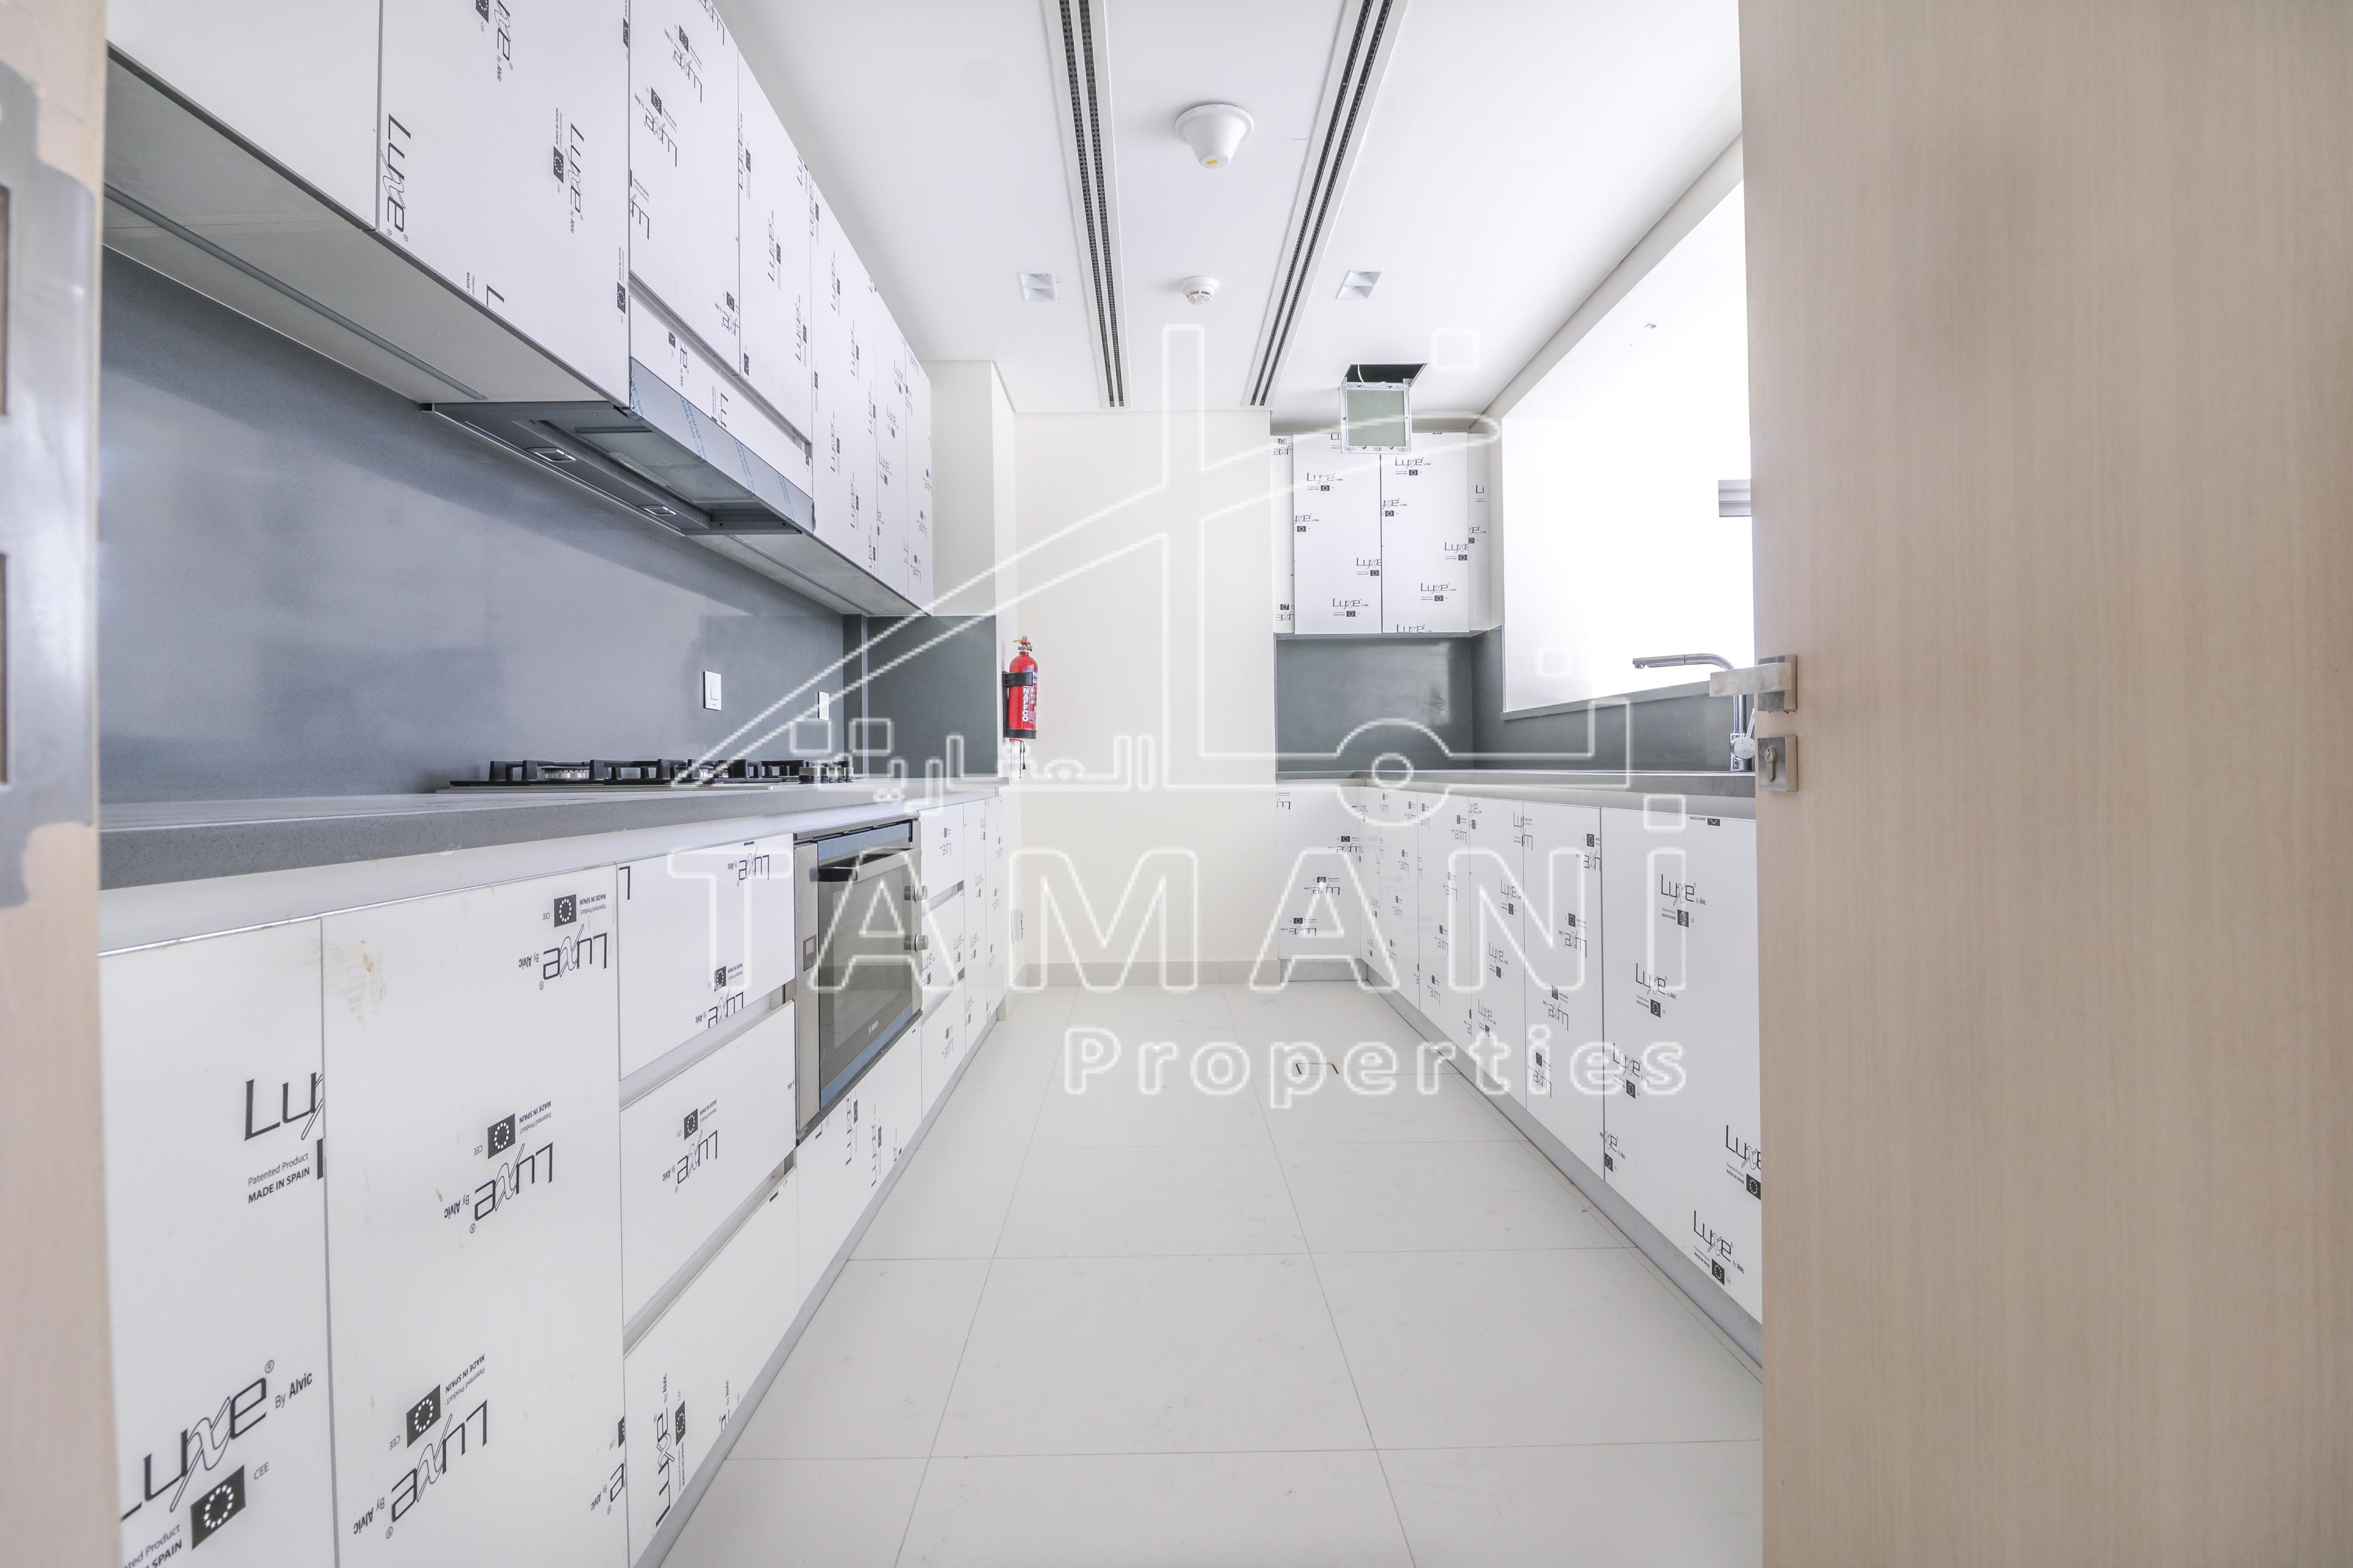 3 Bedrooms w/ Full Lake View Corner Unit - Mada Residences by ARTAR